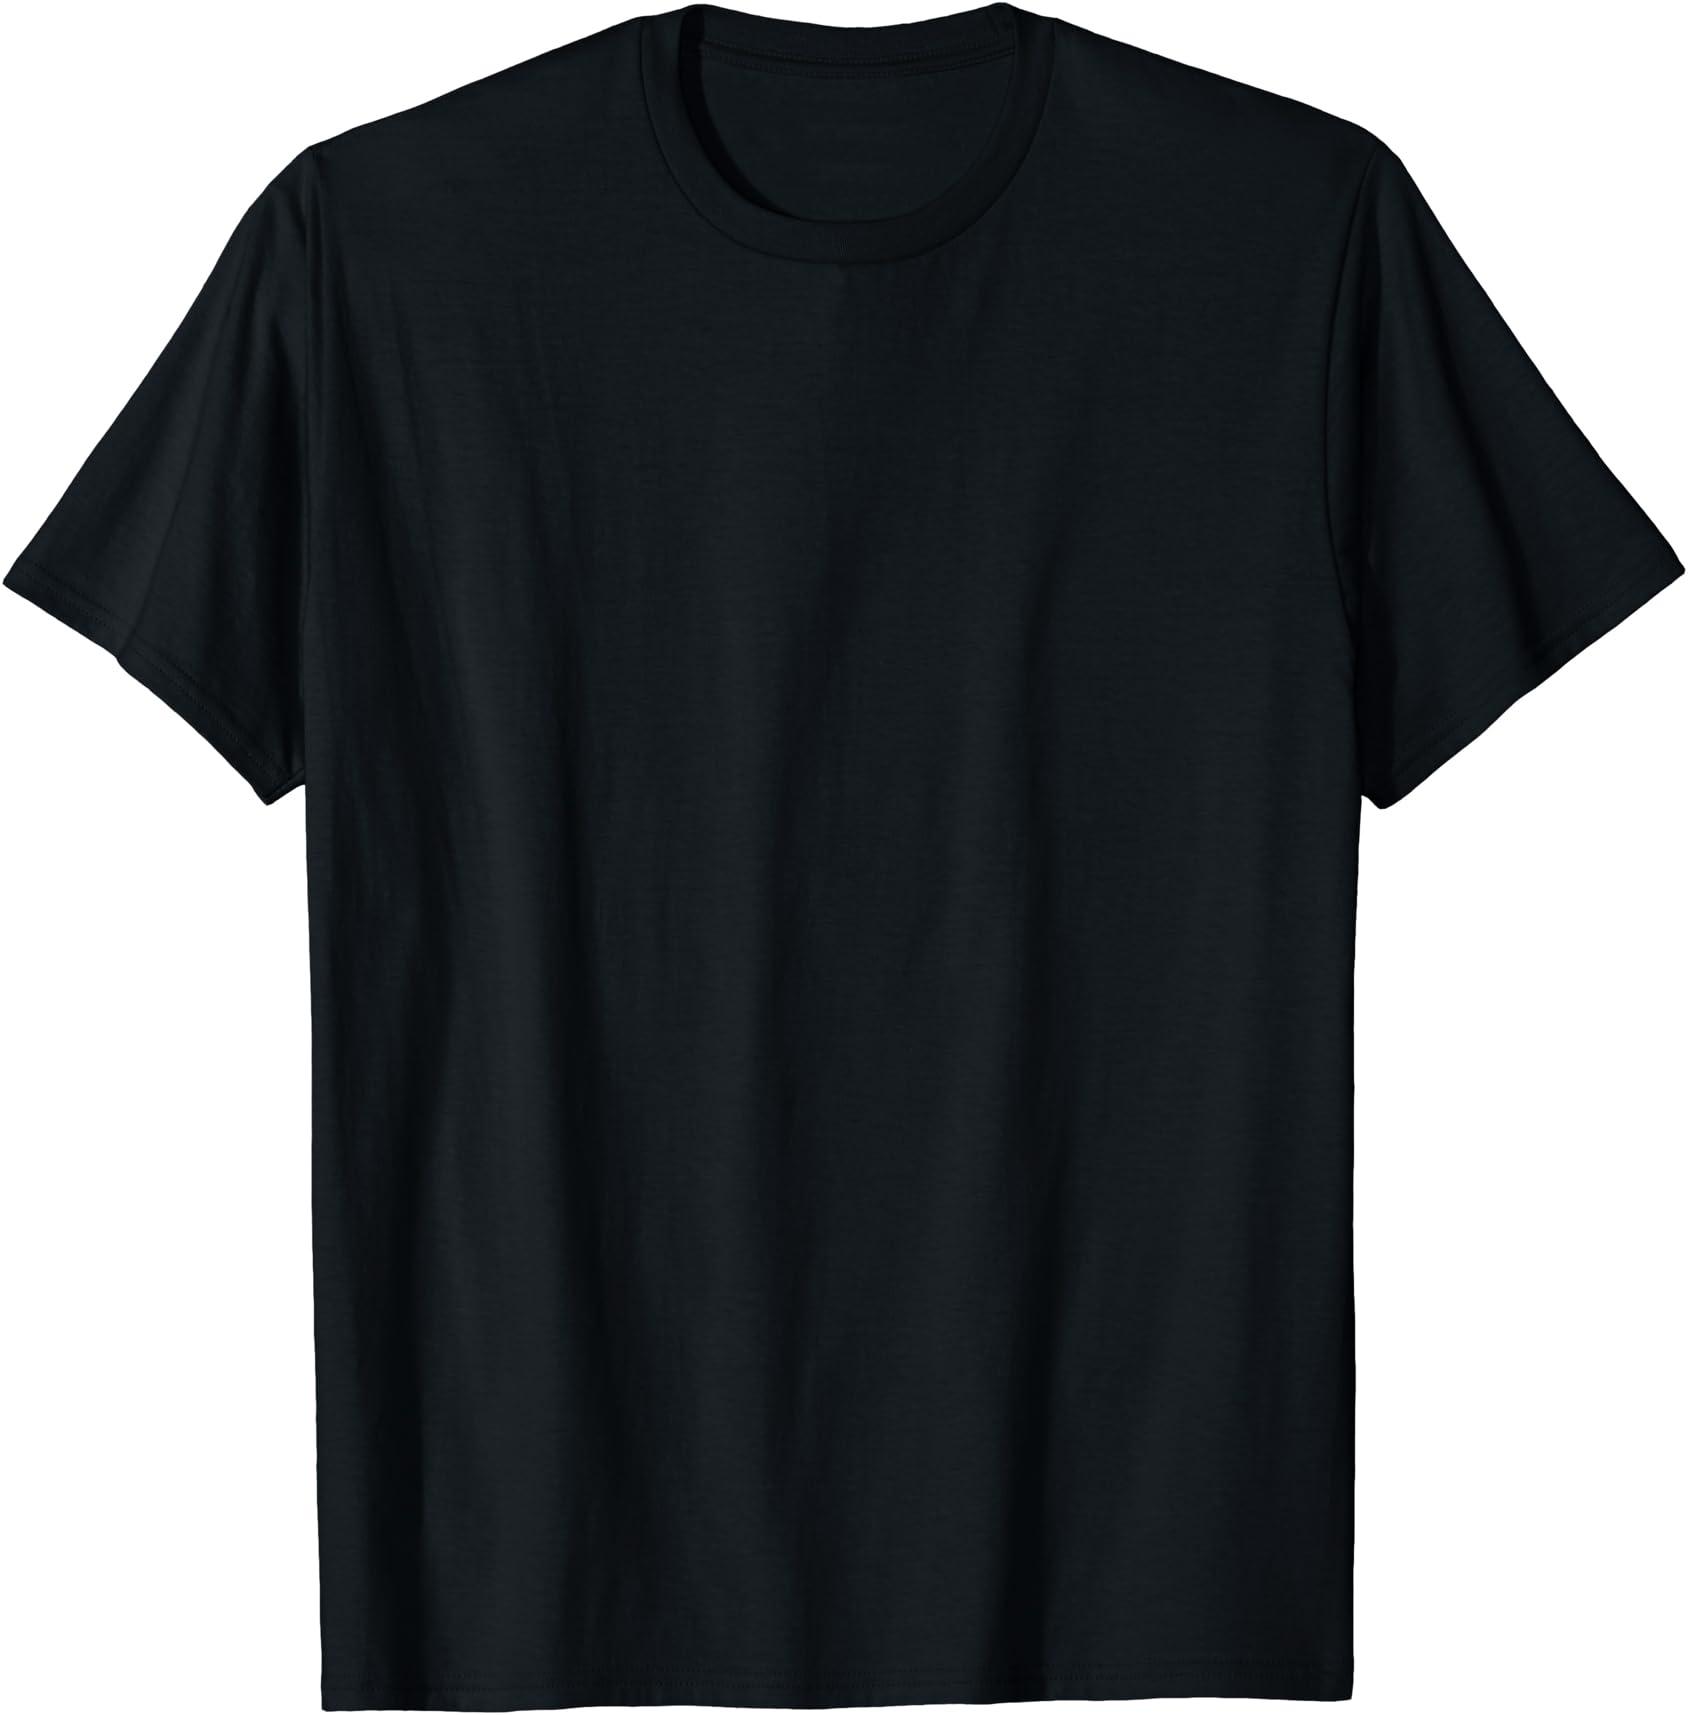 Eat Sleep Drive Black Adult T-Shirt